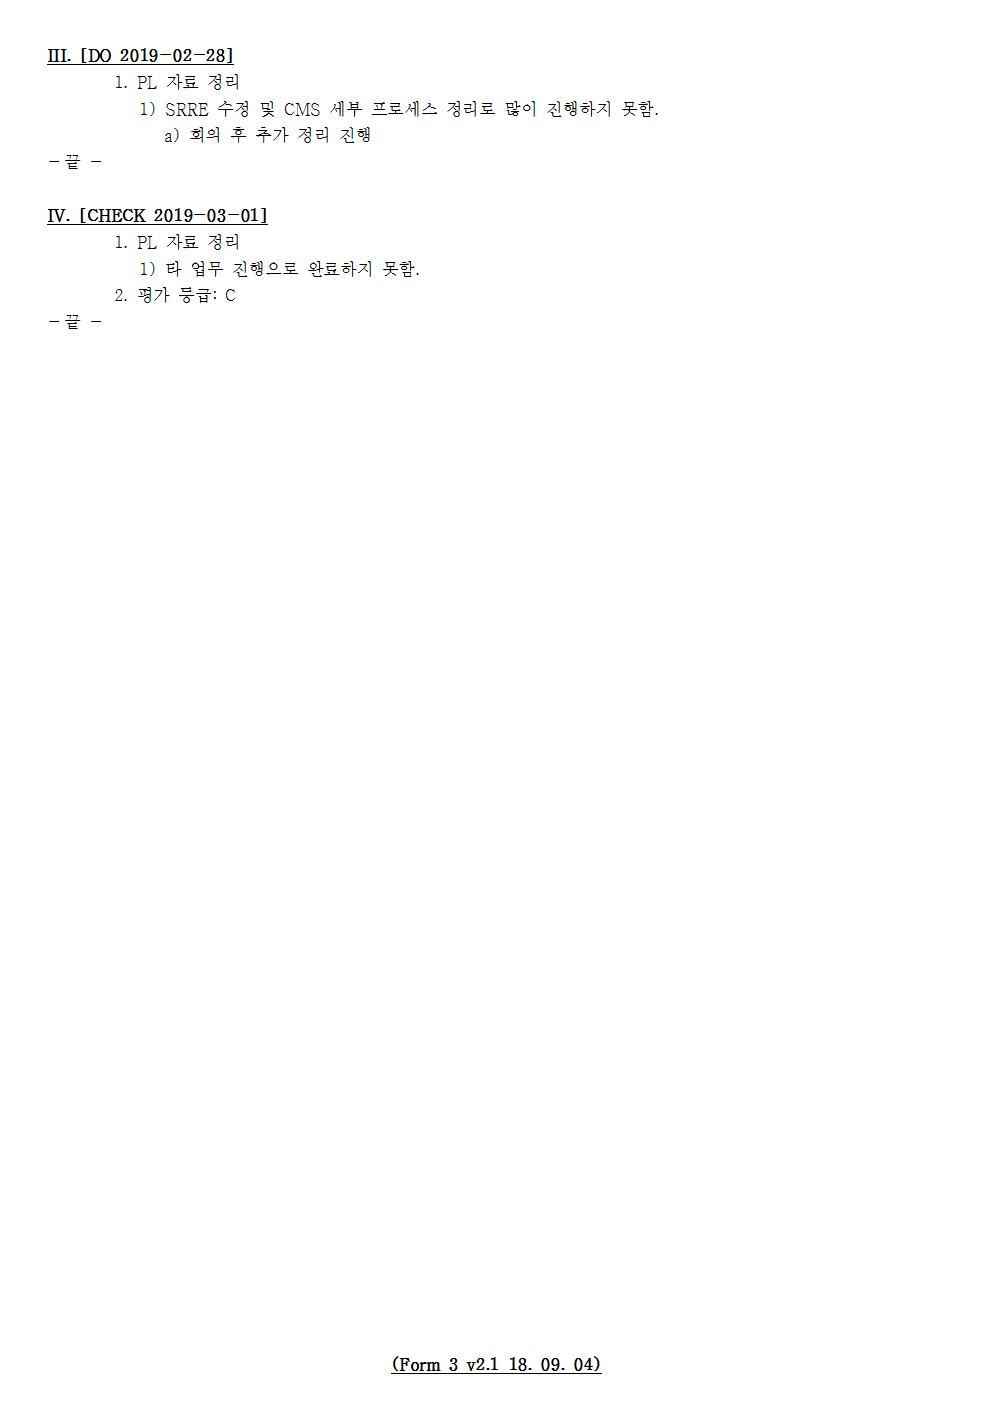 D-[19-014-PP-06]-[Book-PL]-[2019-03-01][JS]002.jpg